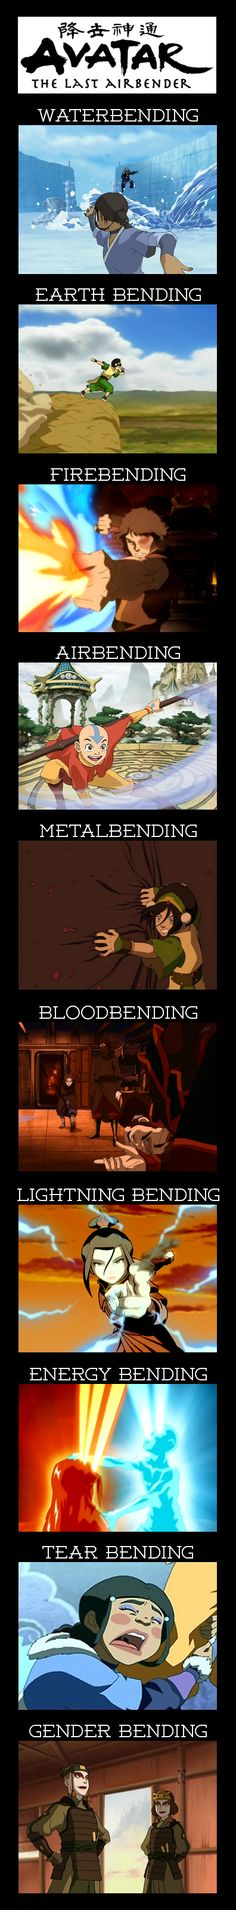 Types of Bending in Avatar